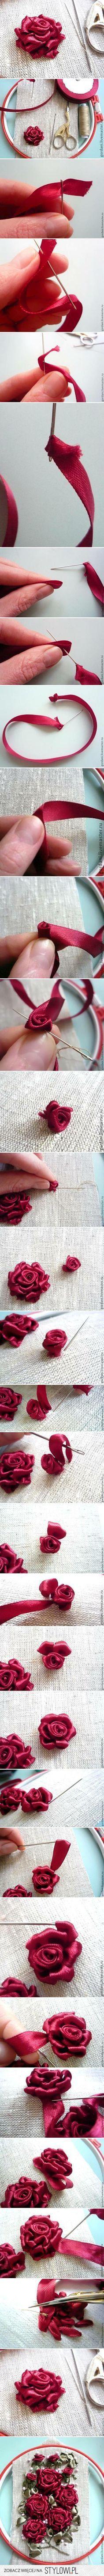 DIY Handbag Embellishment - How to Make Ribbon Roses | Diy handbag ...